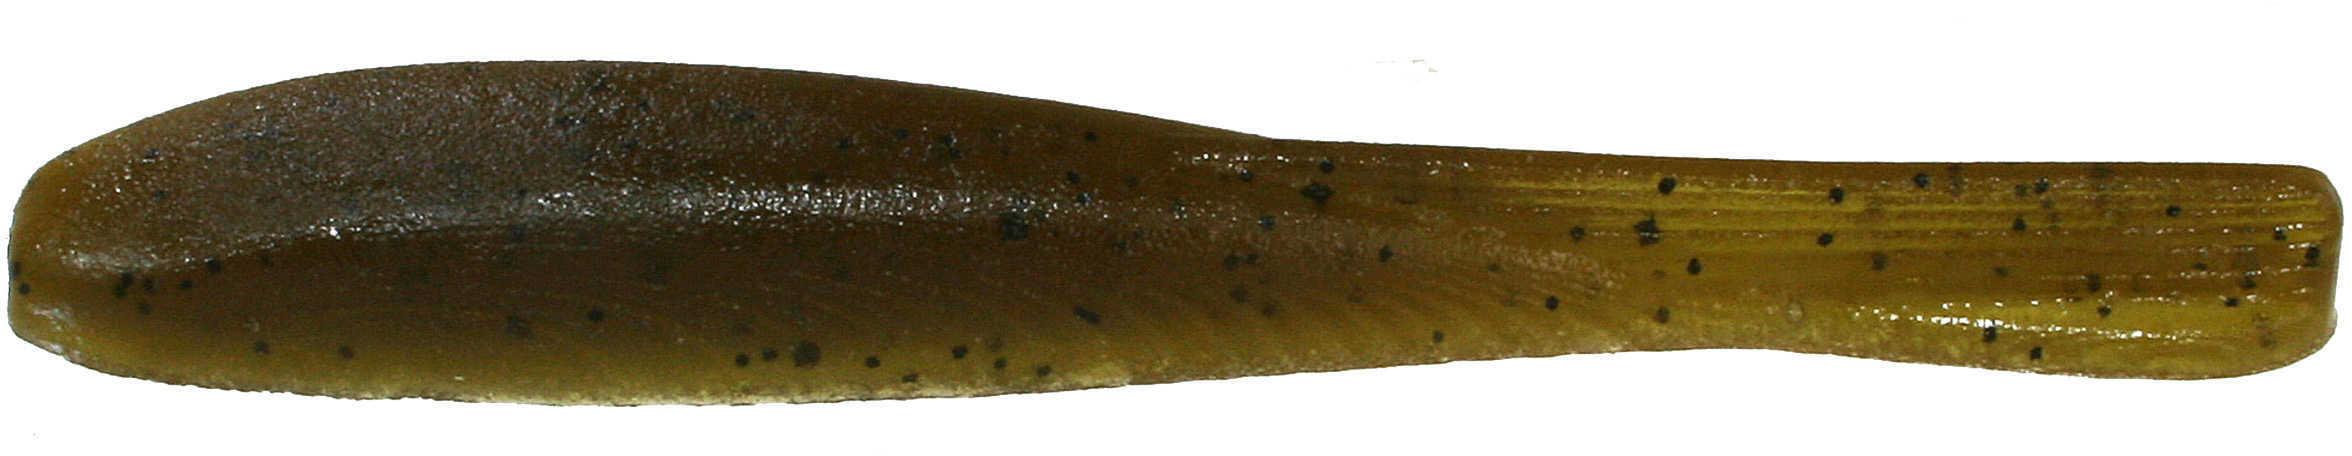 "Jackall Lures Cross Tail Shad Soft Drop Shot Bait Lure 3"" Body Length, Green Pumpkin Pepper, Per 8 Md: JCTS3-GPP"